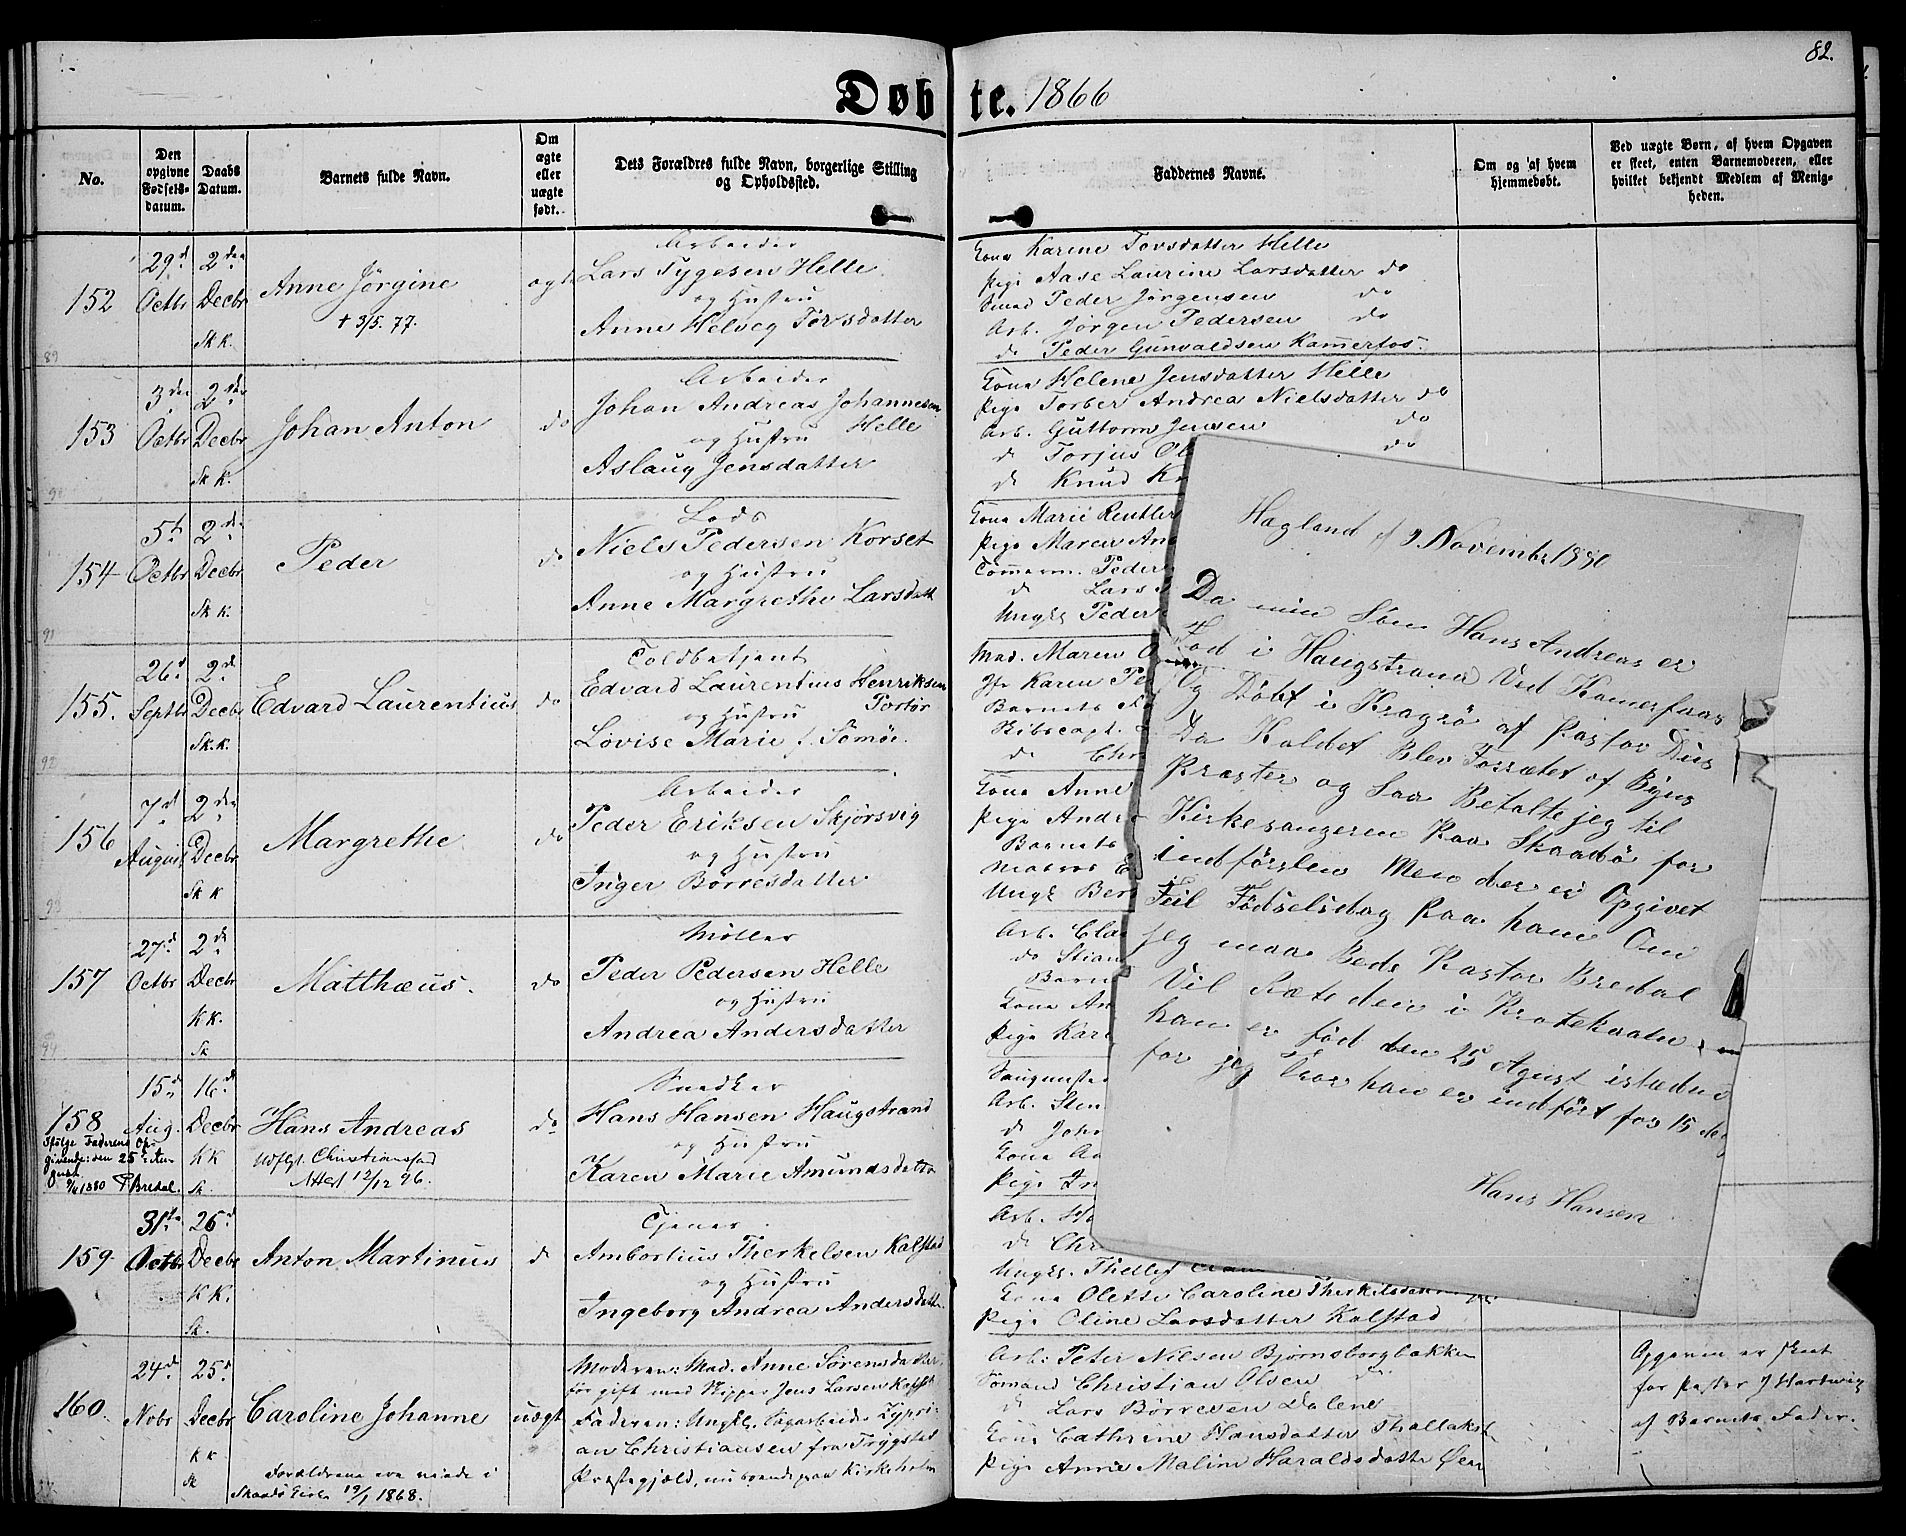 SAKO, Sannidal kirkebøker, F/Fa/L0011: Parish register (official) no. 11, 1863-1873, p. 82